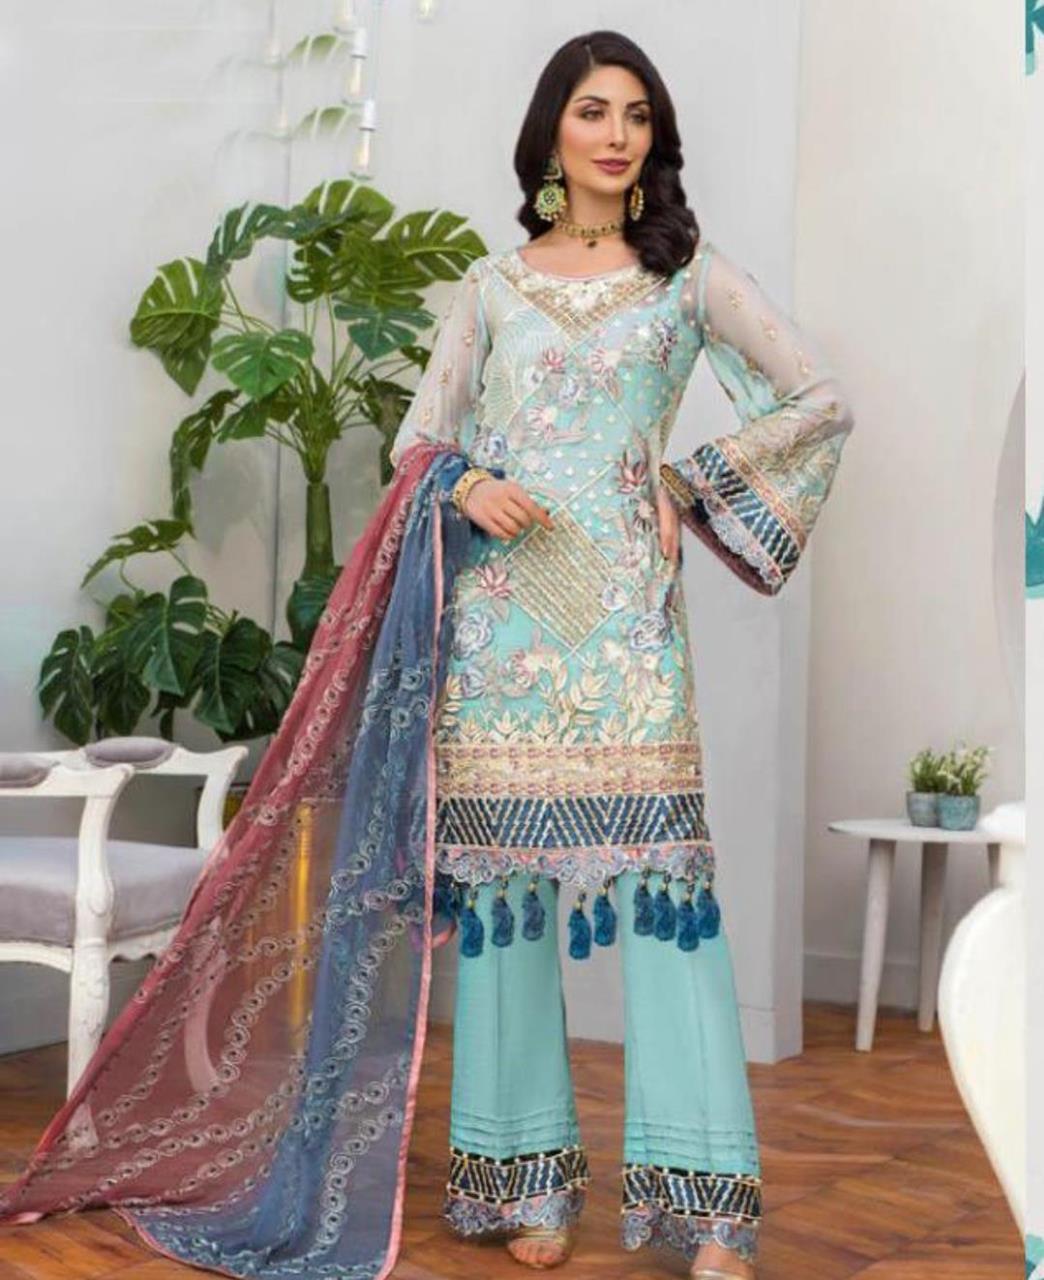 Embroidered Georgette Straight cut Salwar Kameez in Sky Blue